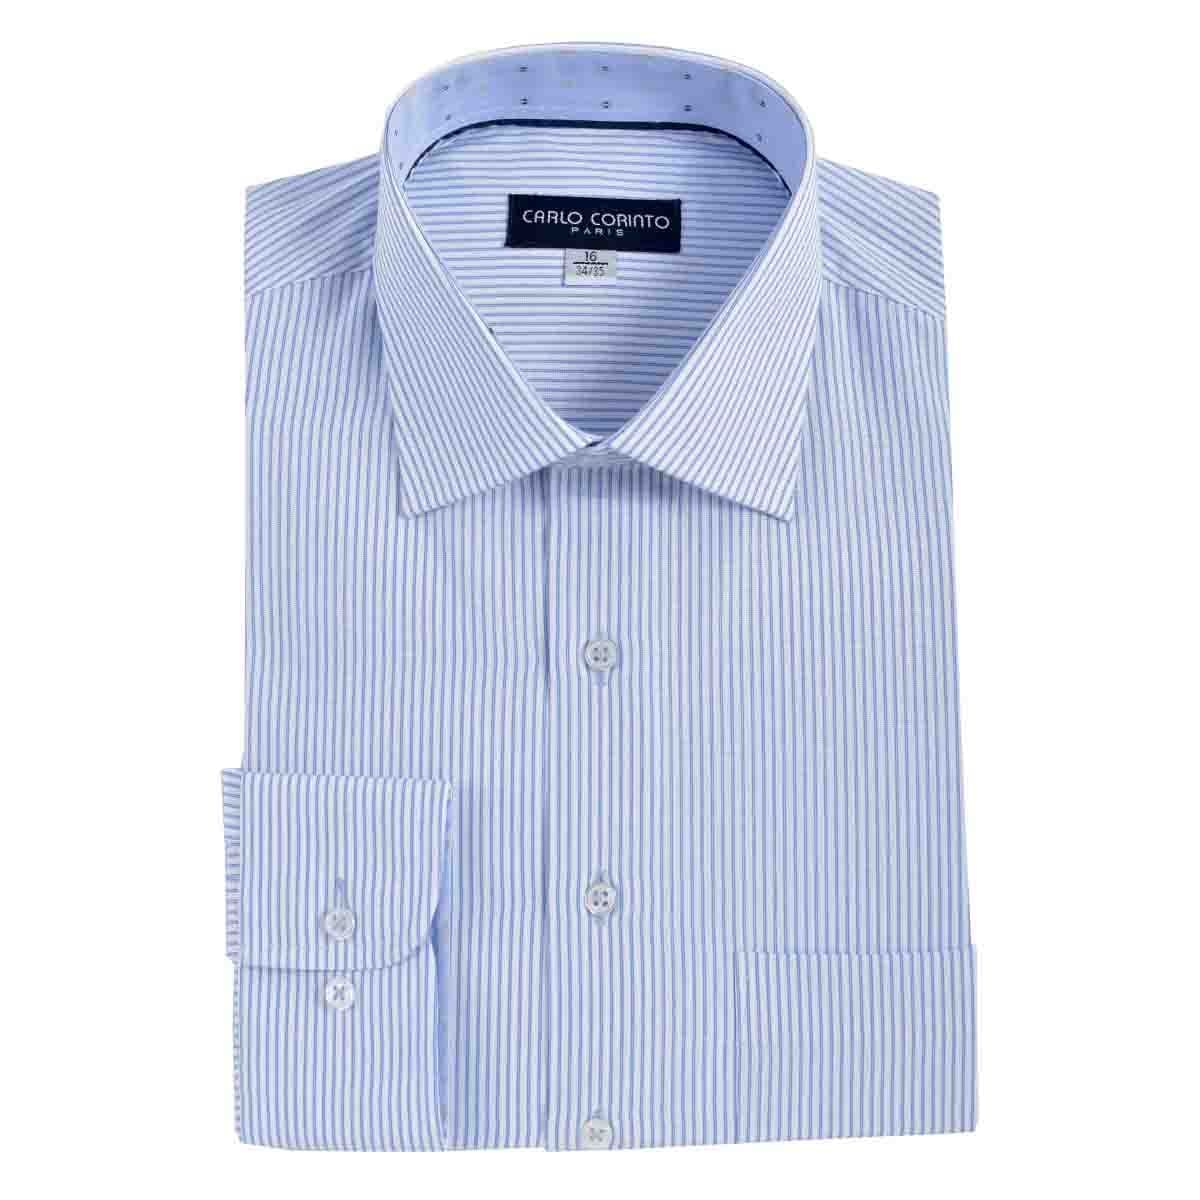 Camisa de Vestir Tradicional Azul Secf 07 Carlo Corinto